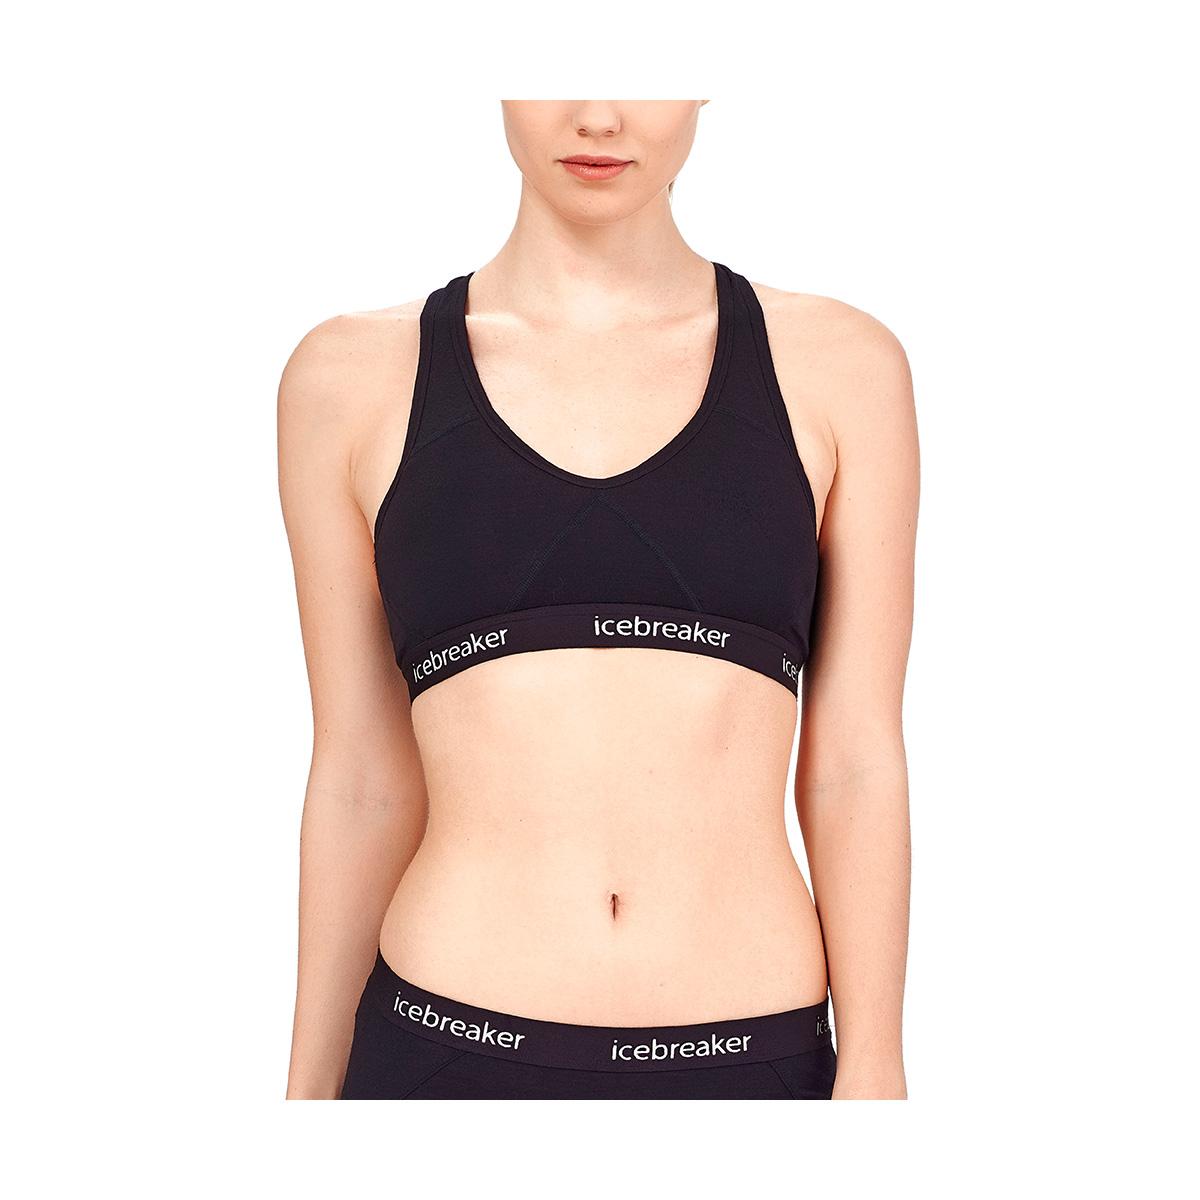 icebreaker内衣女运动胸衣瑜伽健身bra文胸排汗透气防异味103020